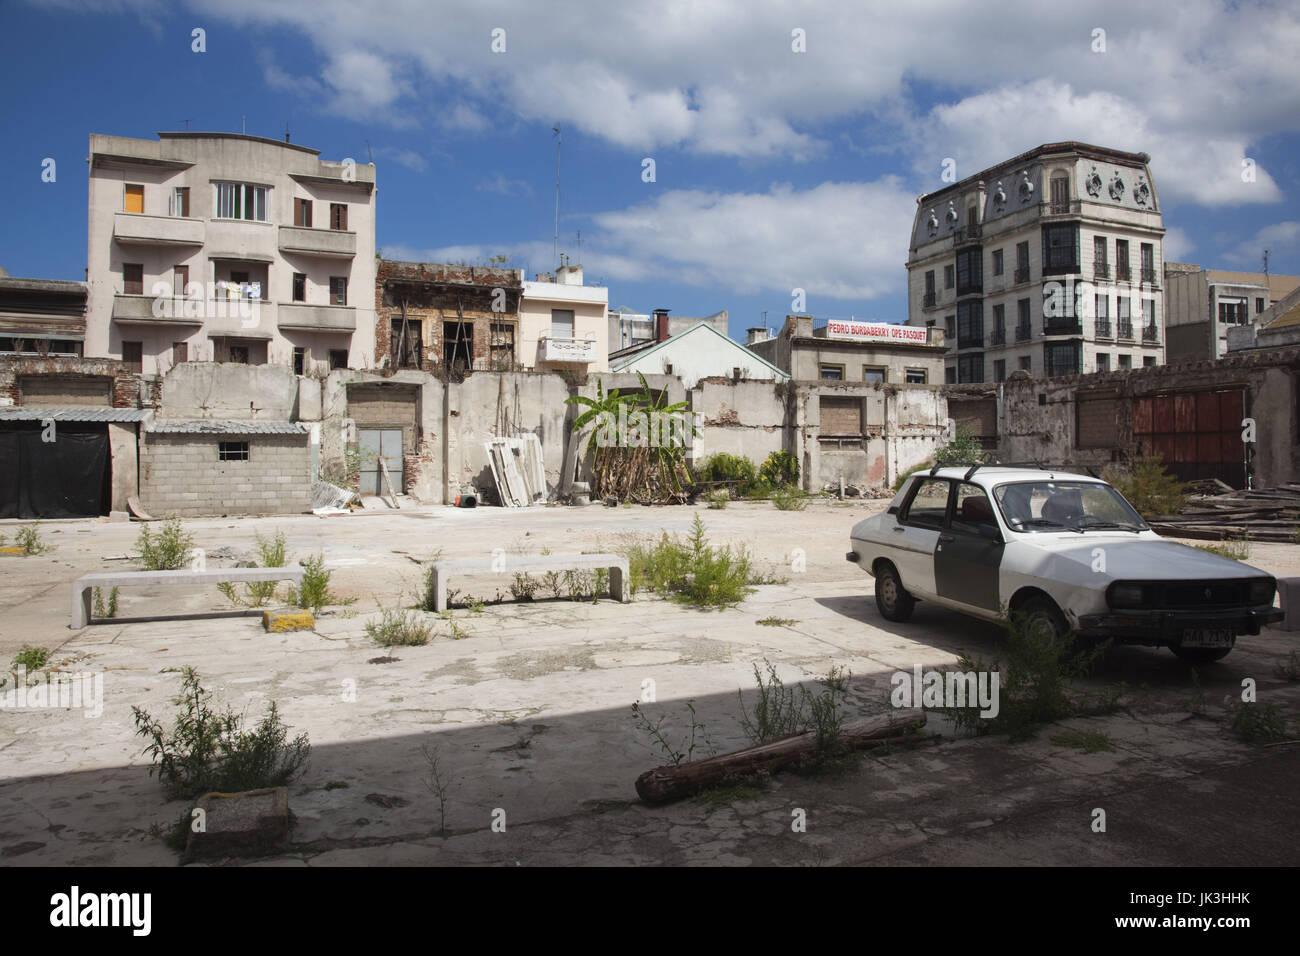 Uruguay, Montevideo, port neighborhood detail - Stock Image